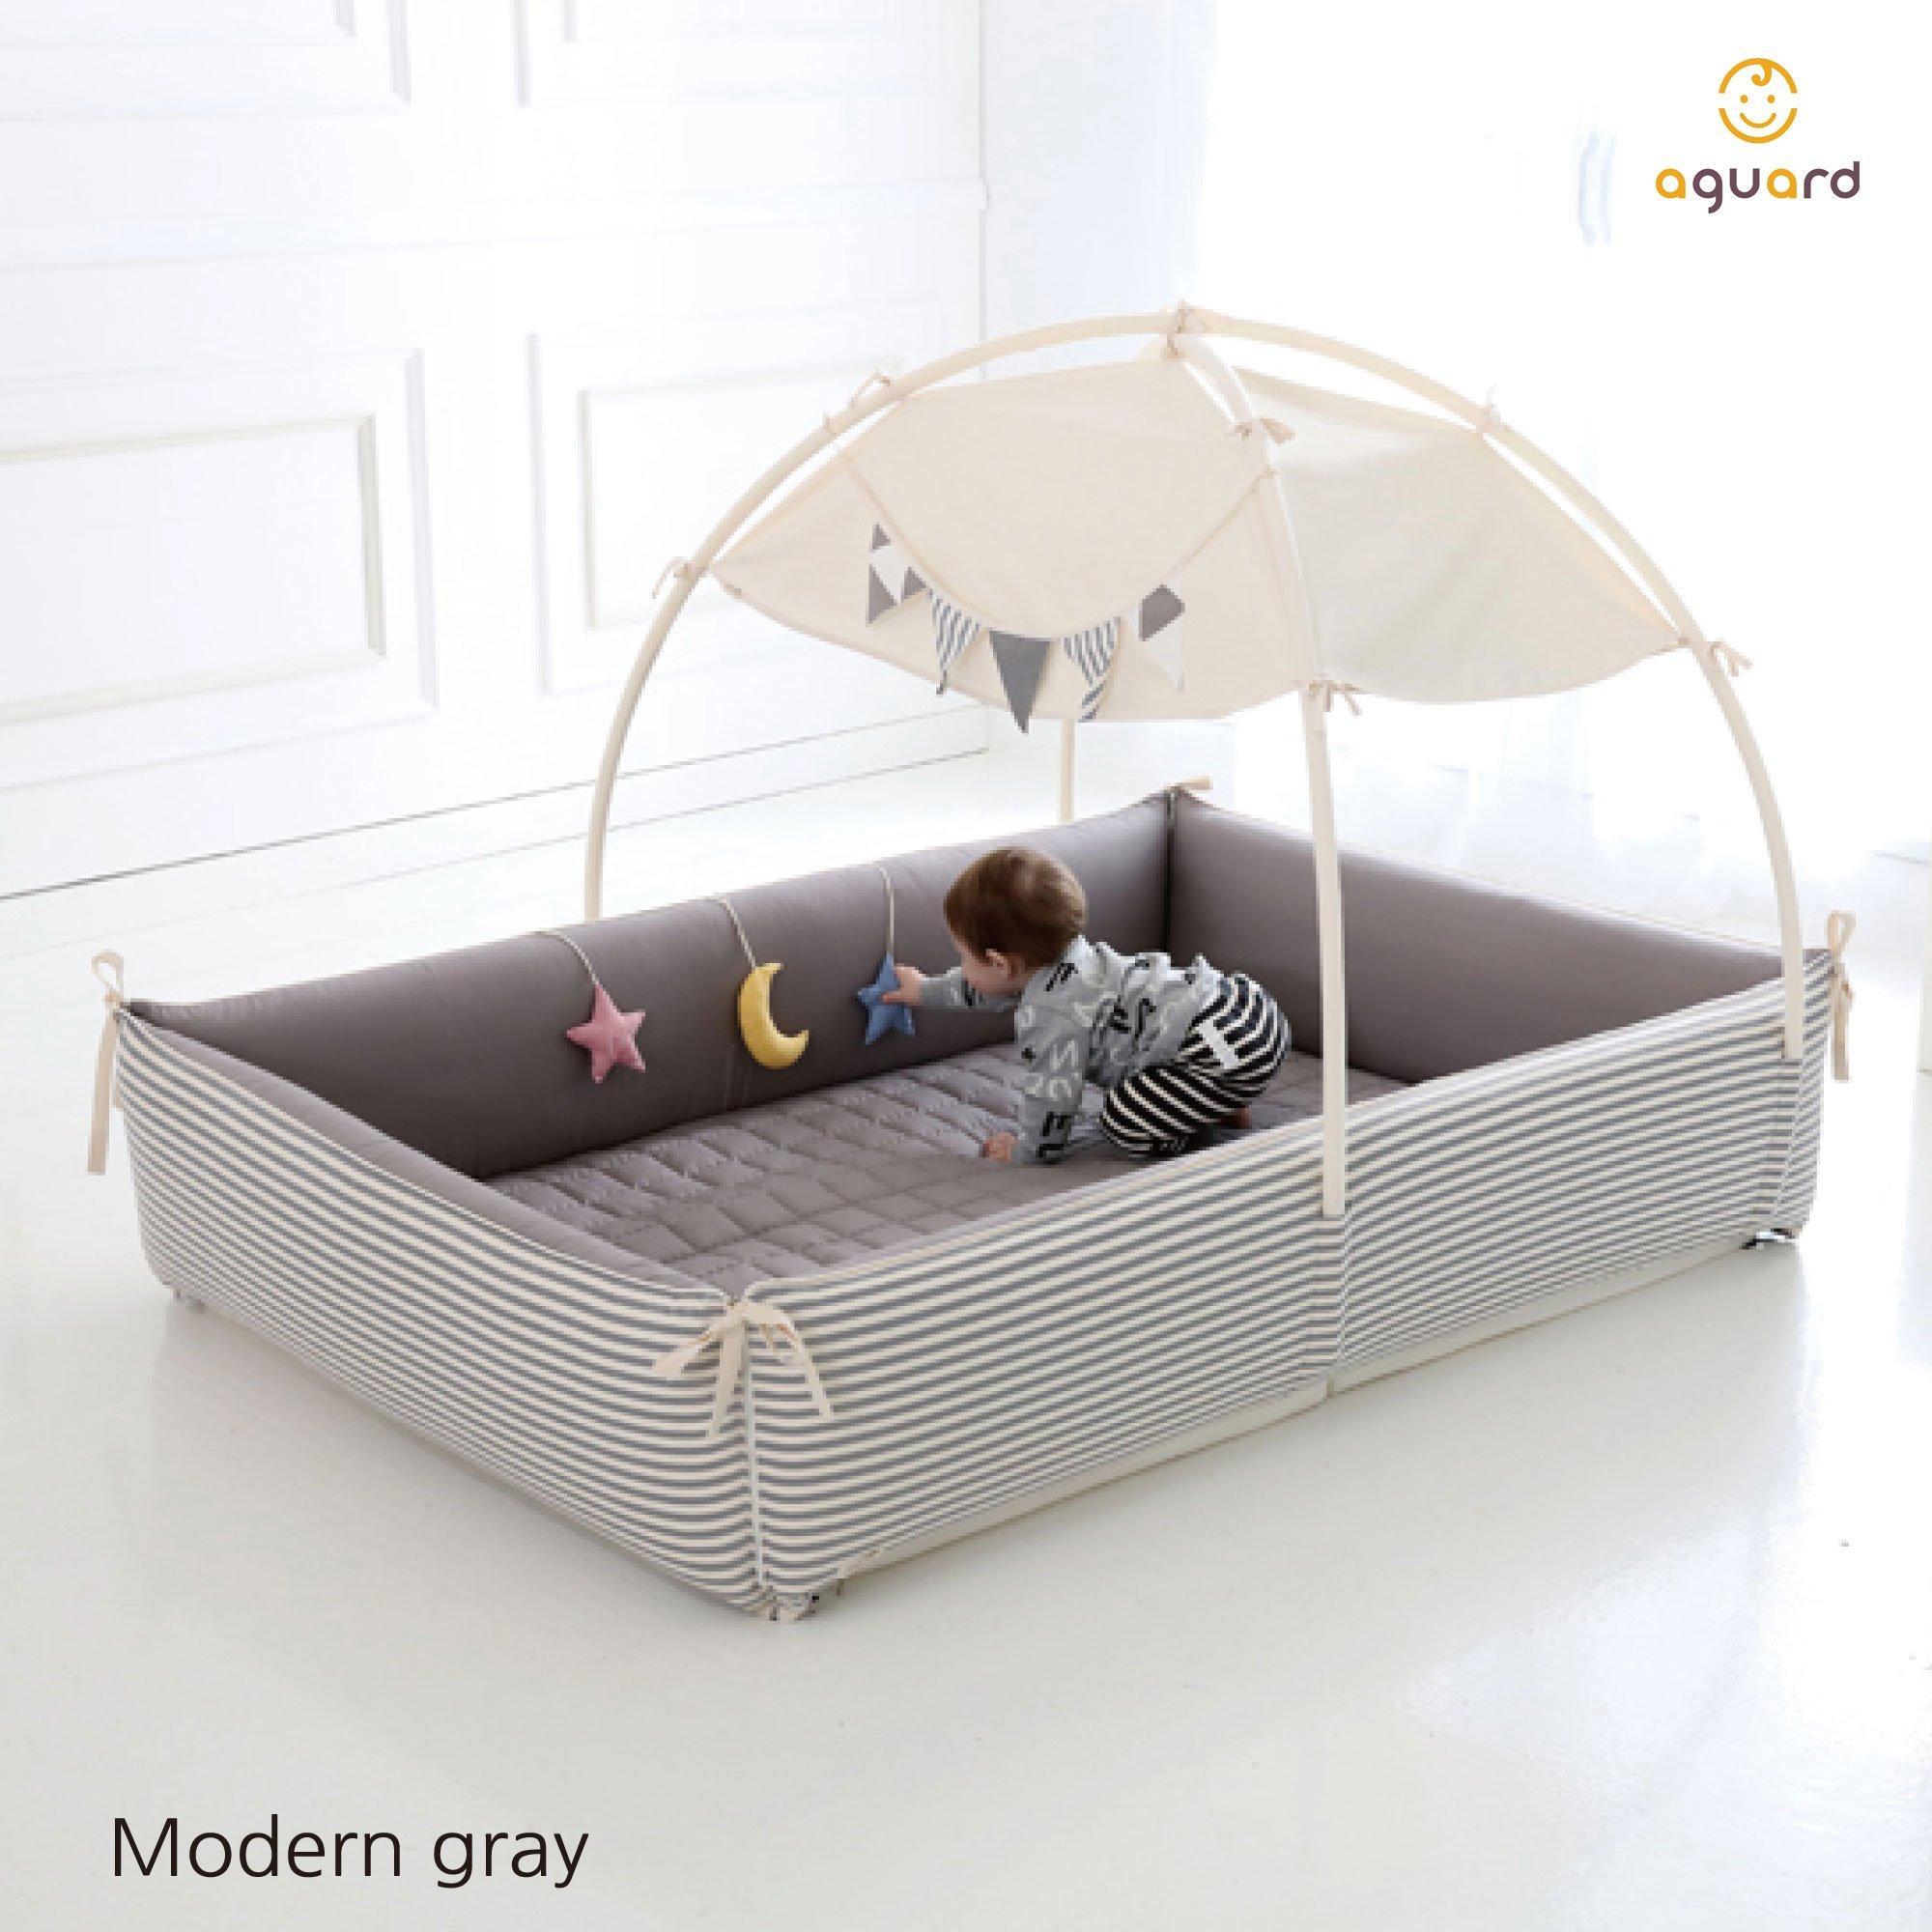 AGUARD Bumper Bed (L) - Modern Grey [EXCLUSIVE DEA